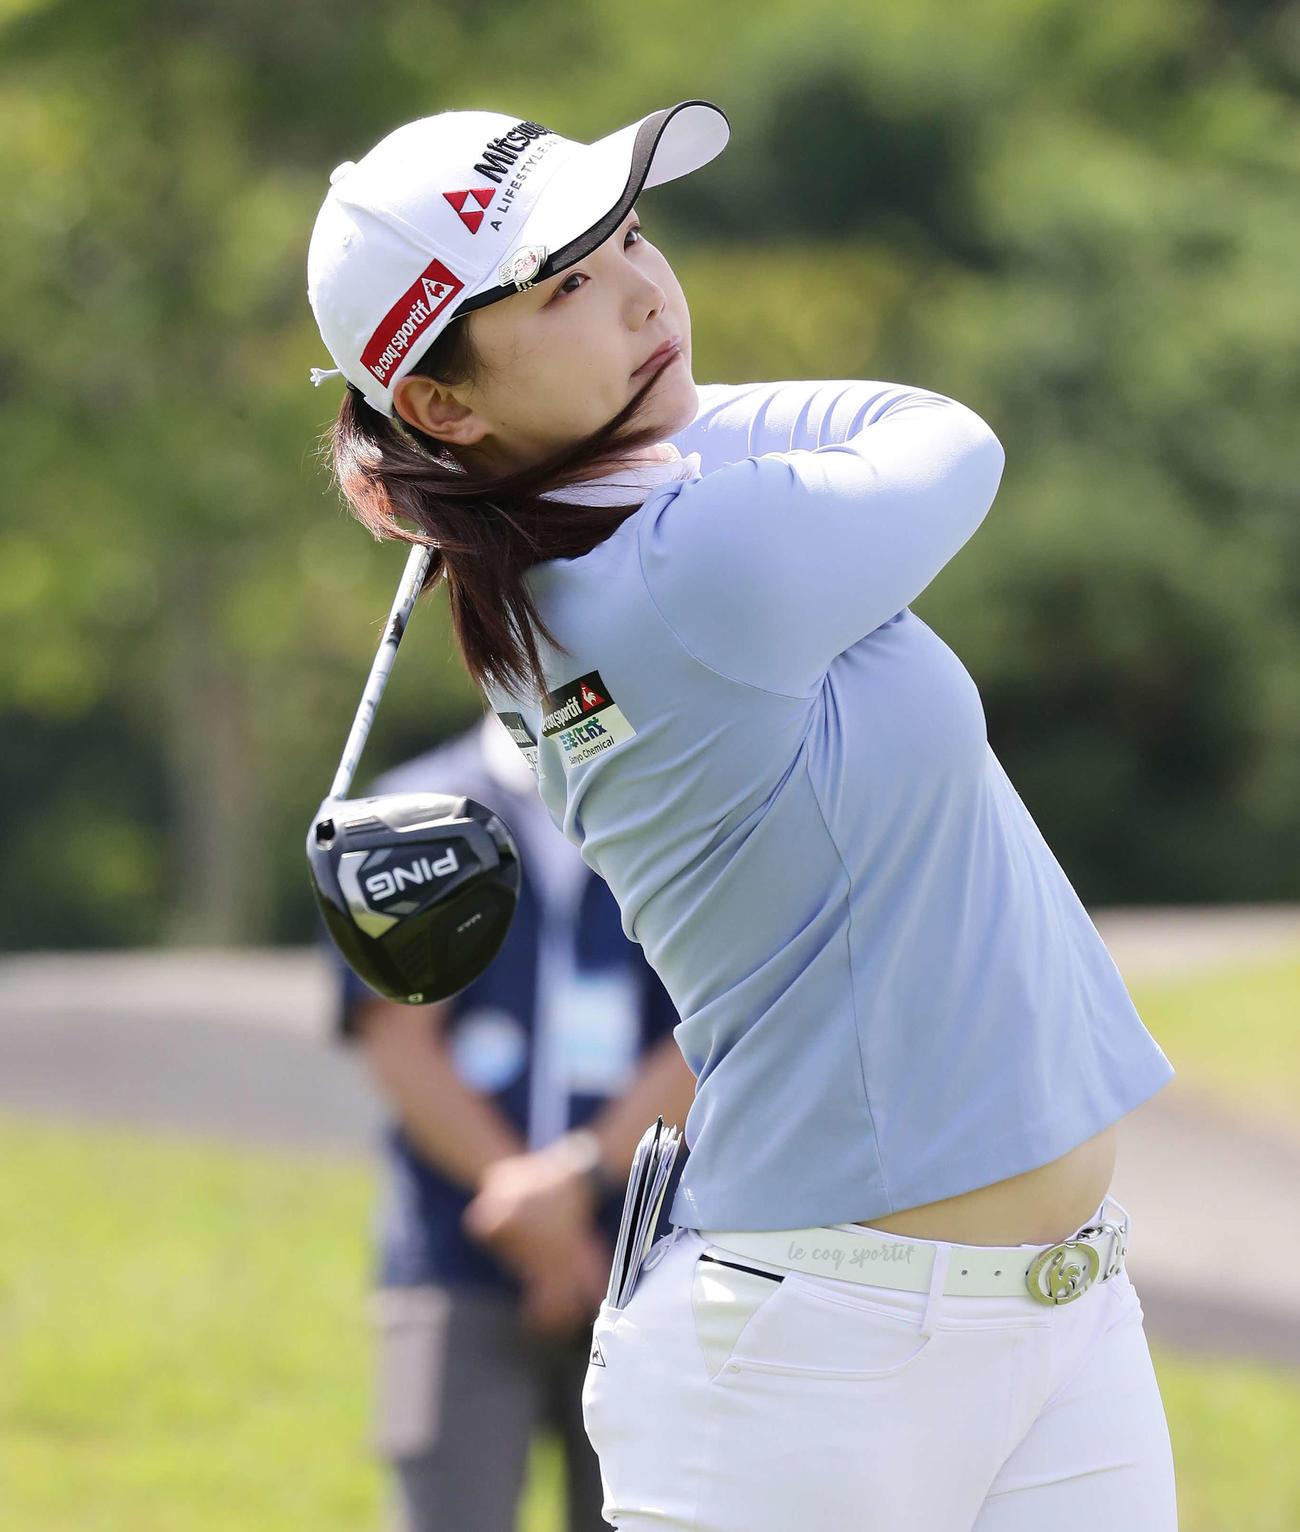 https://www.nikkansports.com/sports/golf/news/img/202106030000143-w1300_15.jpg